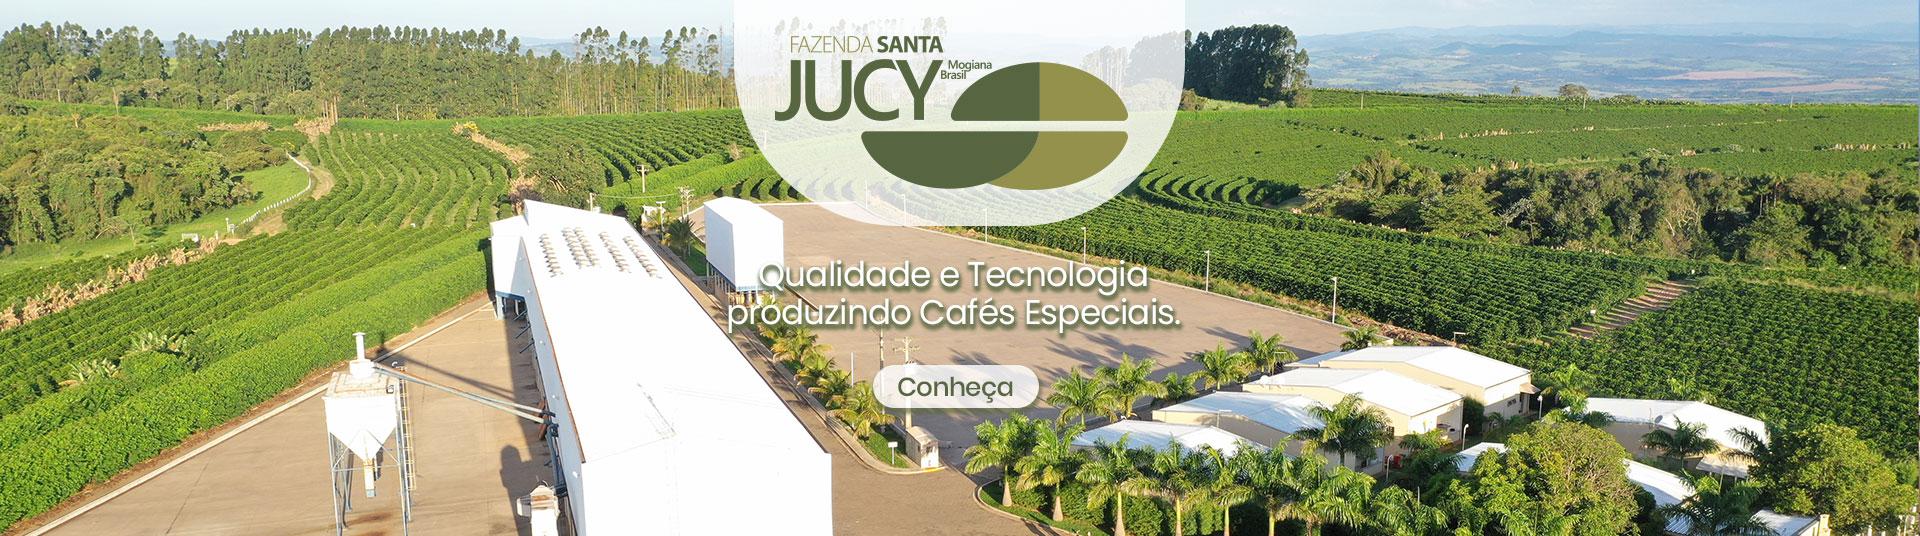 fazenda-santa-jucy-café